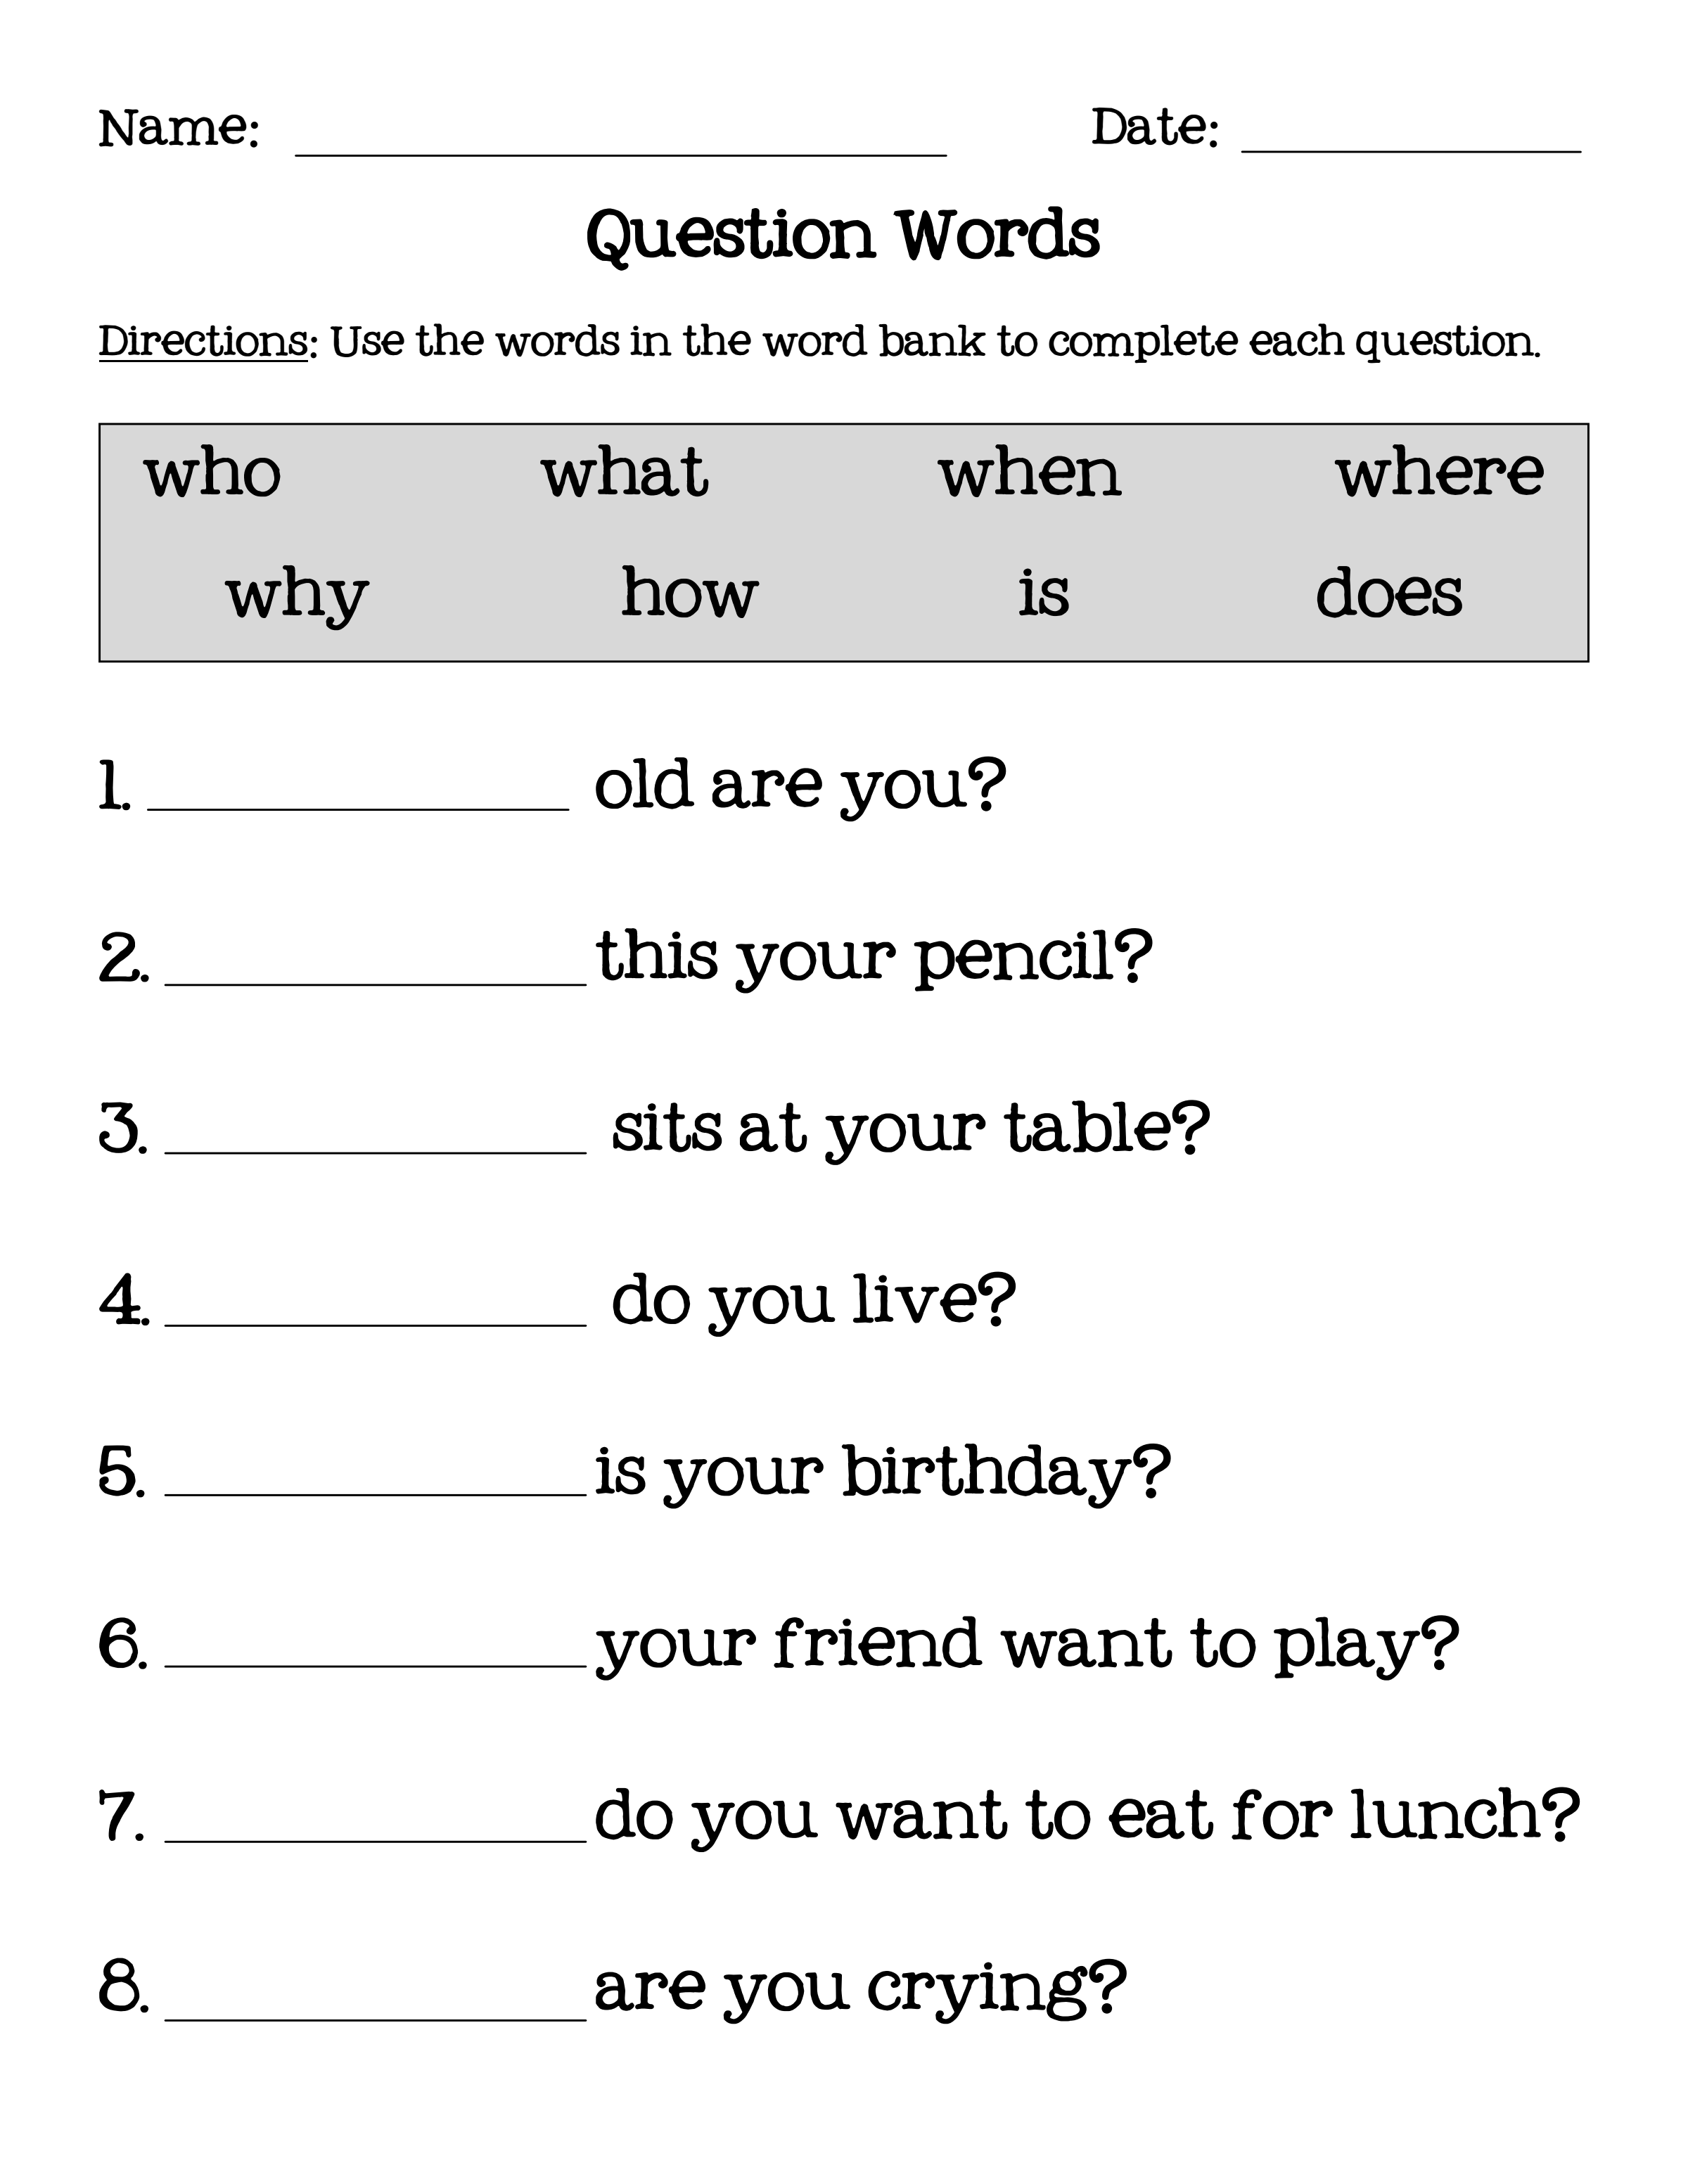 דף 1 מתוך 1 This or that questions, Wh questions